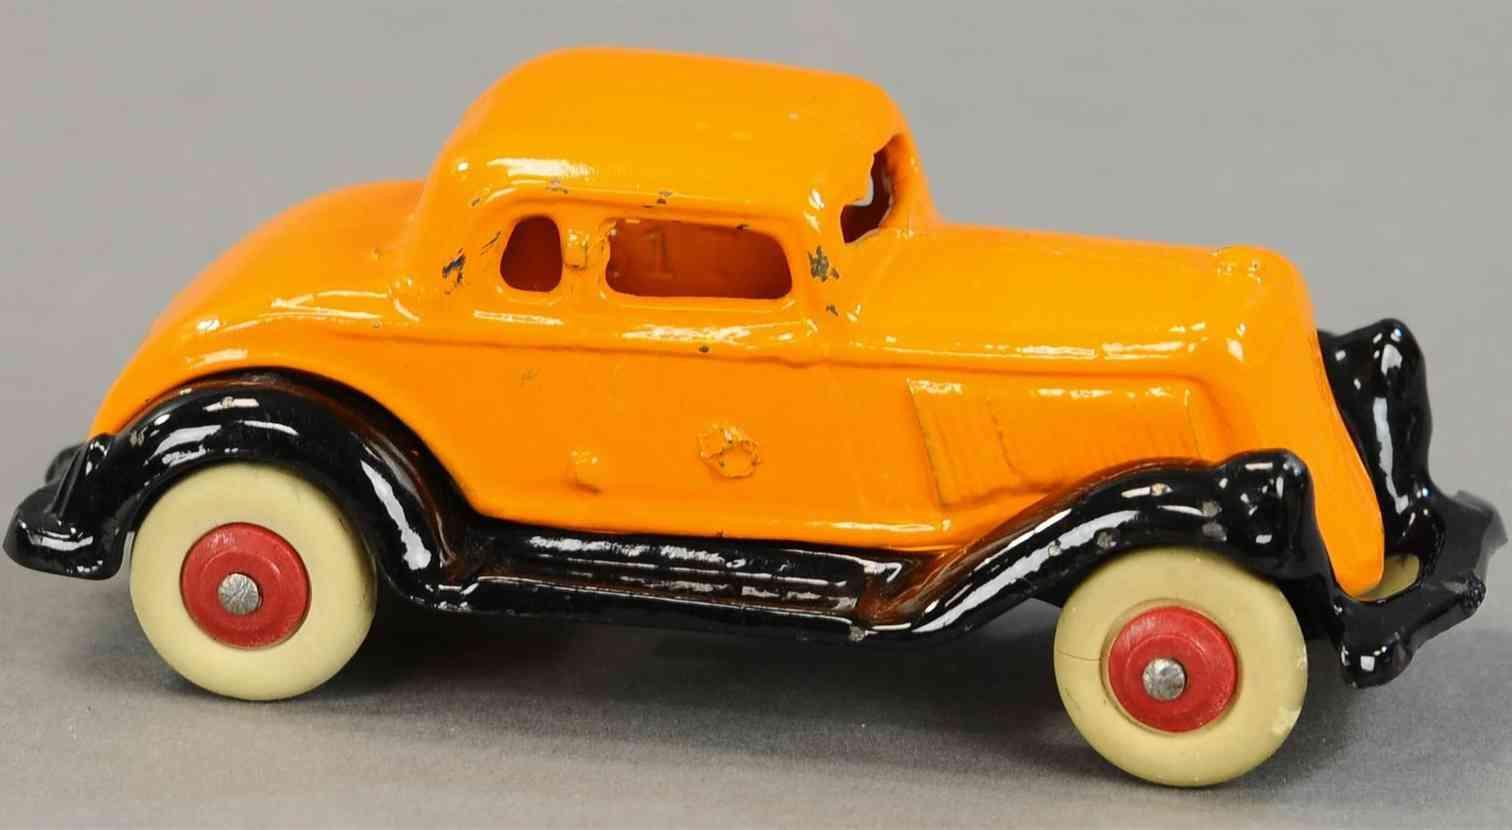 williams ac cast iron toy car coupe made of cast iron orange black